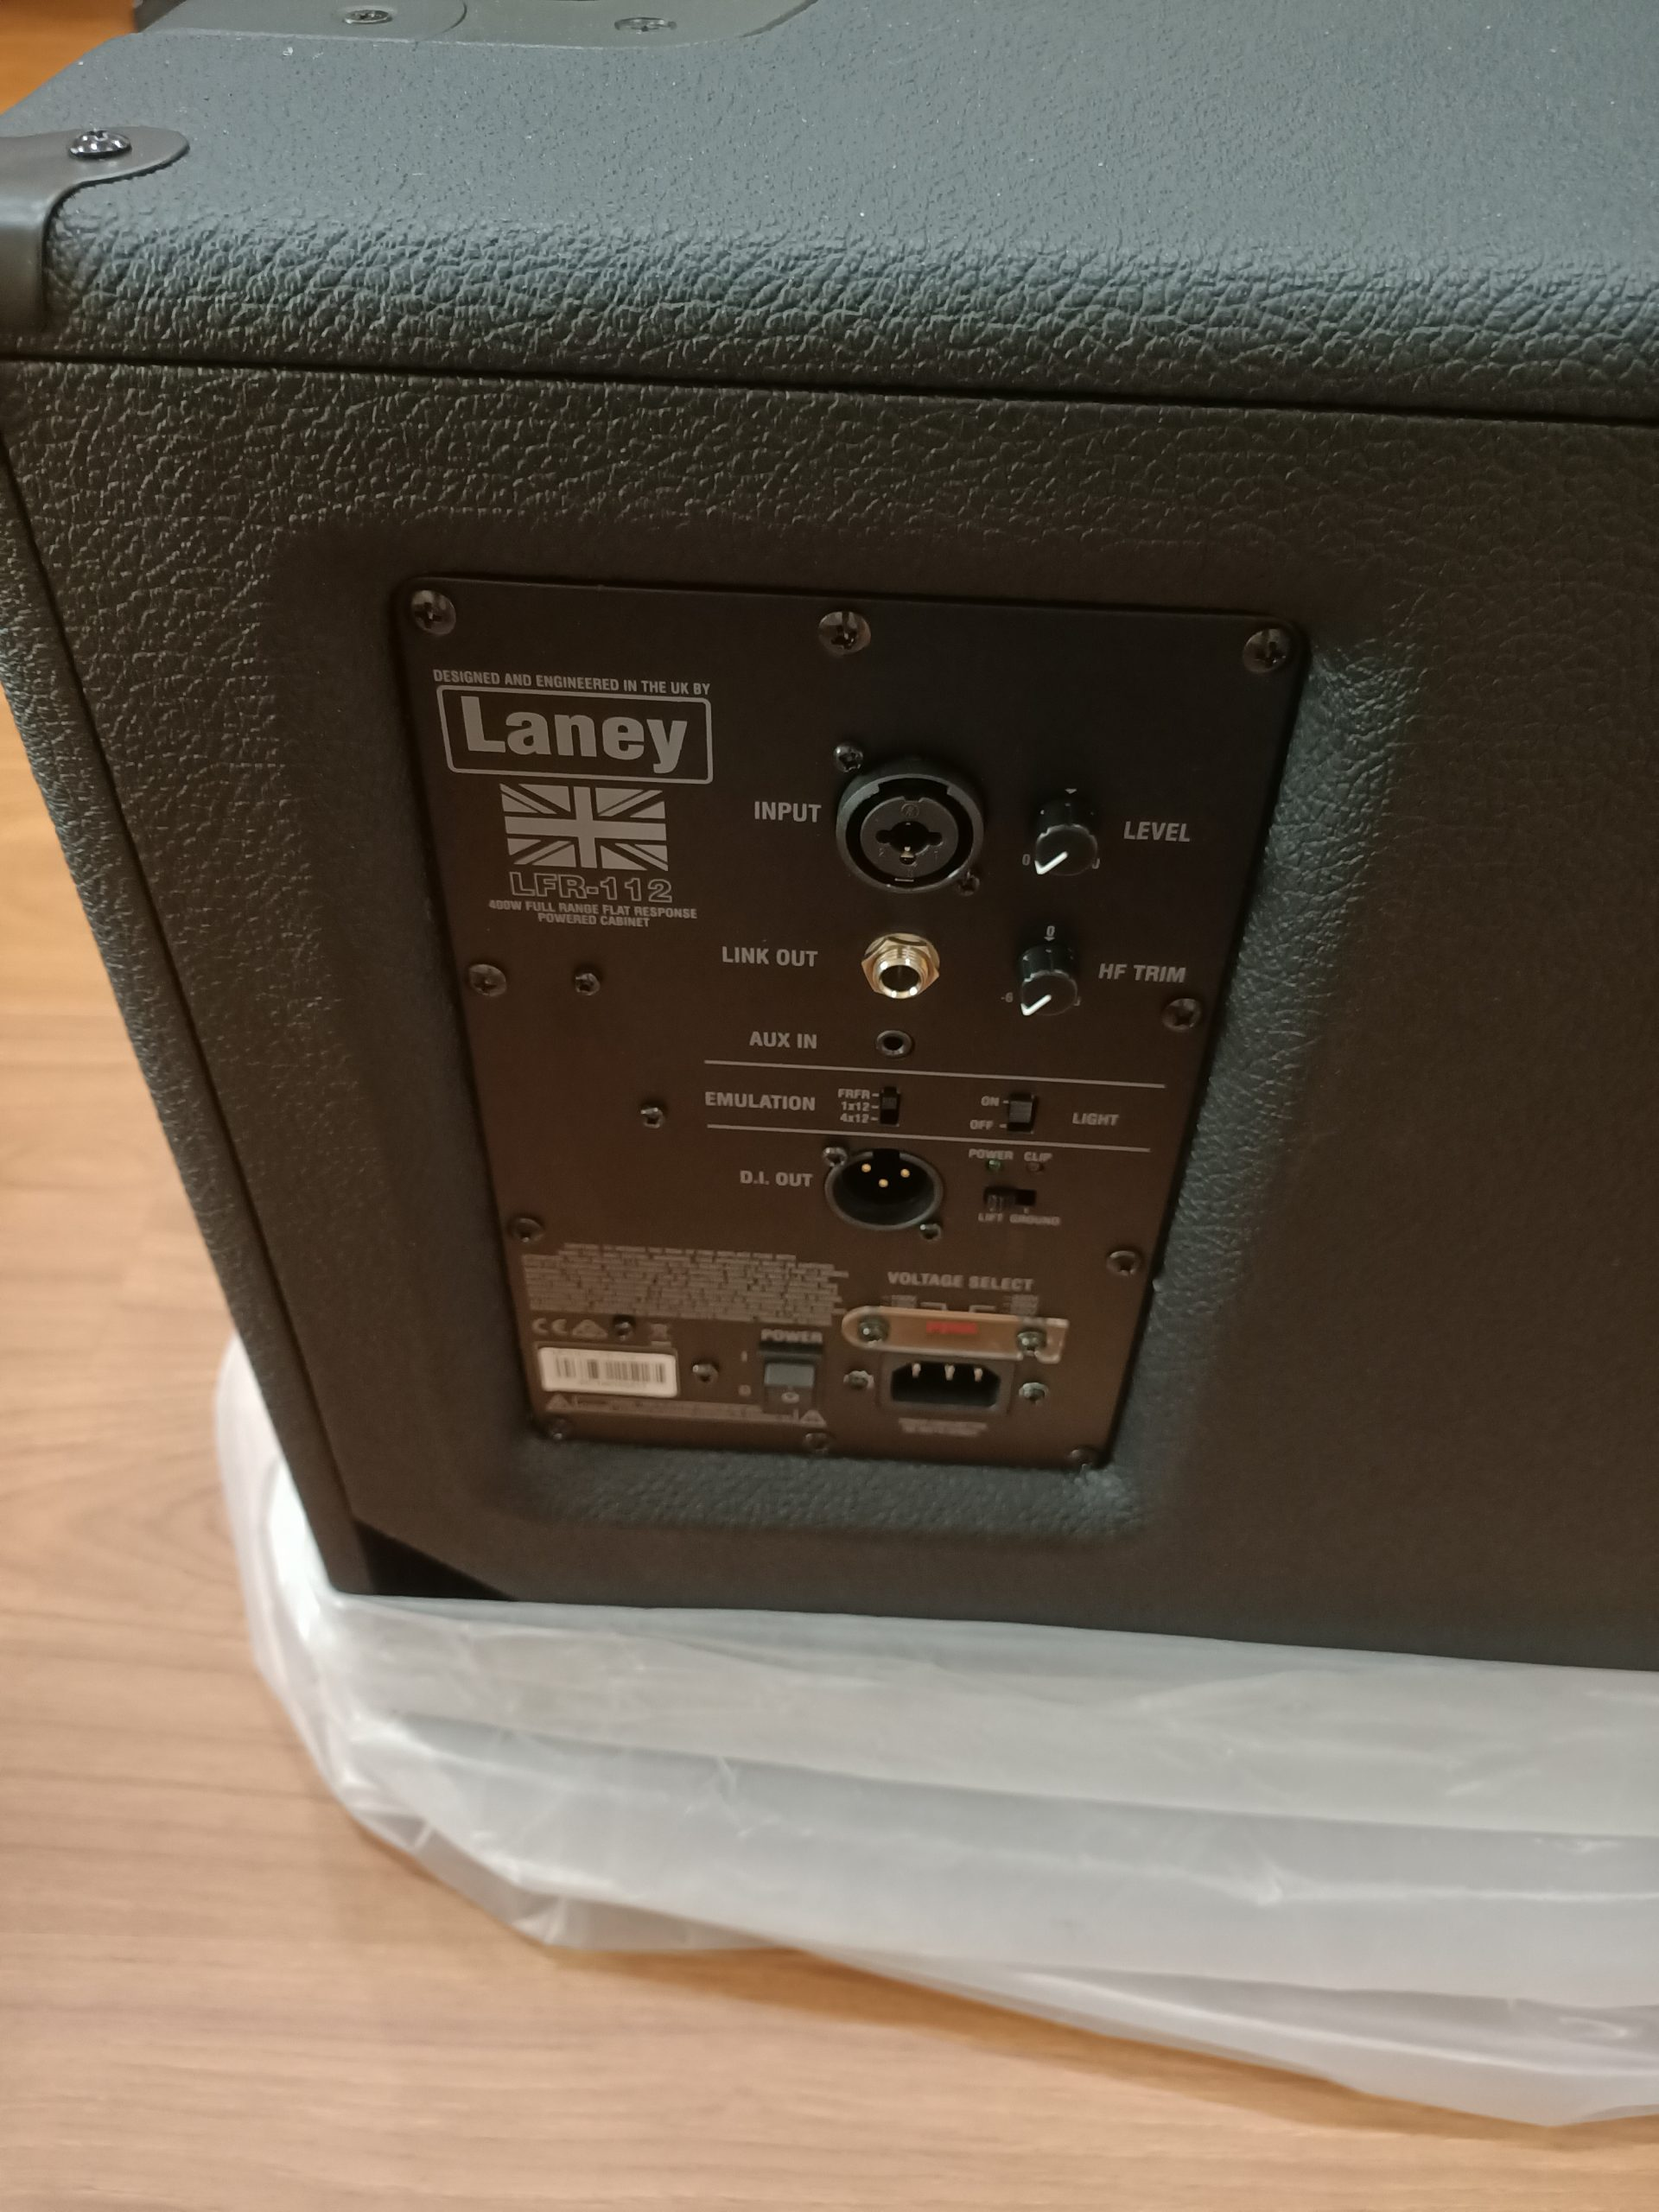 Laney LFR-112 400 Watt FRFR Powered Cabinet